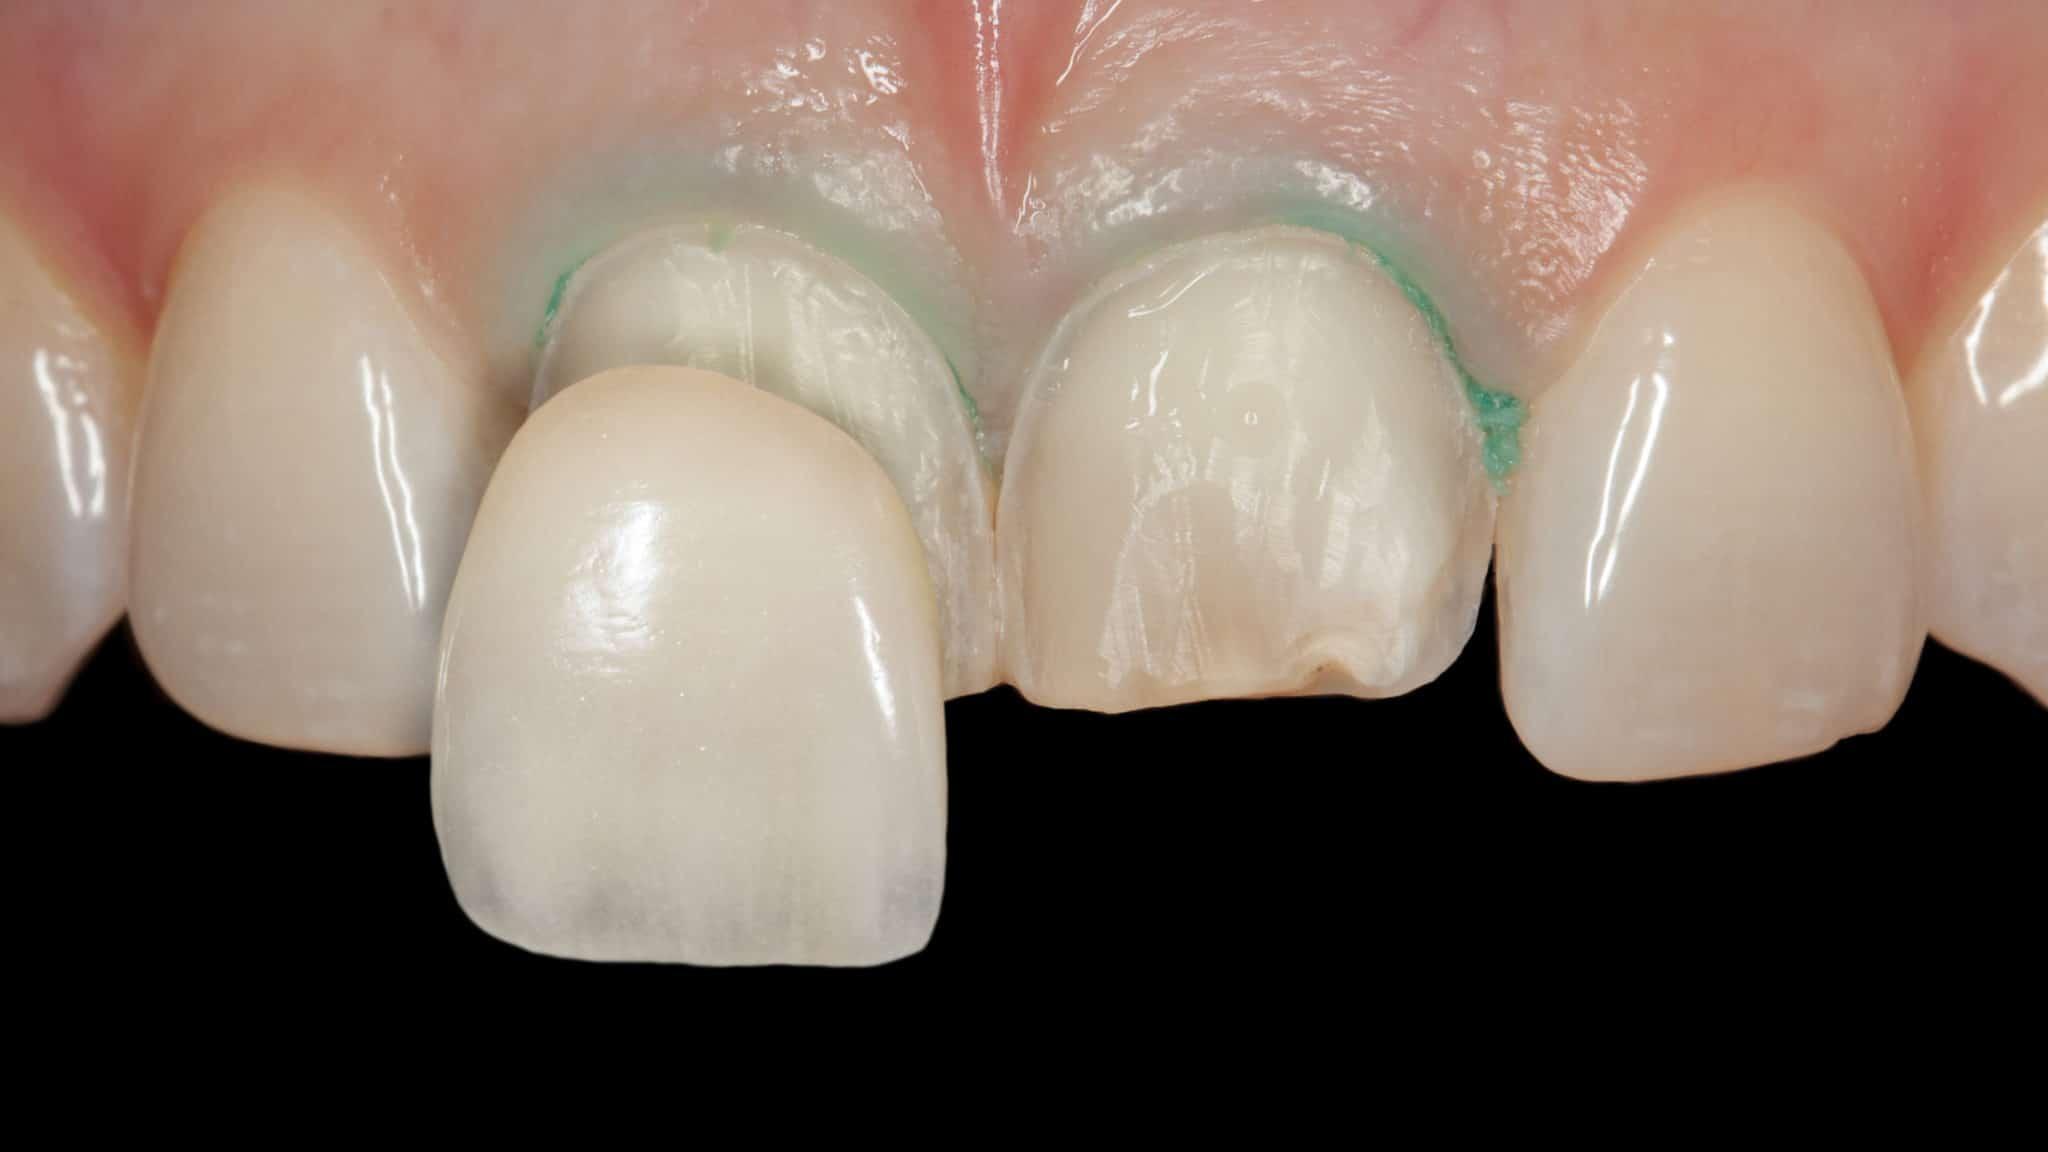 veneers can straighten teeth and also help improve tmj disorder